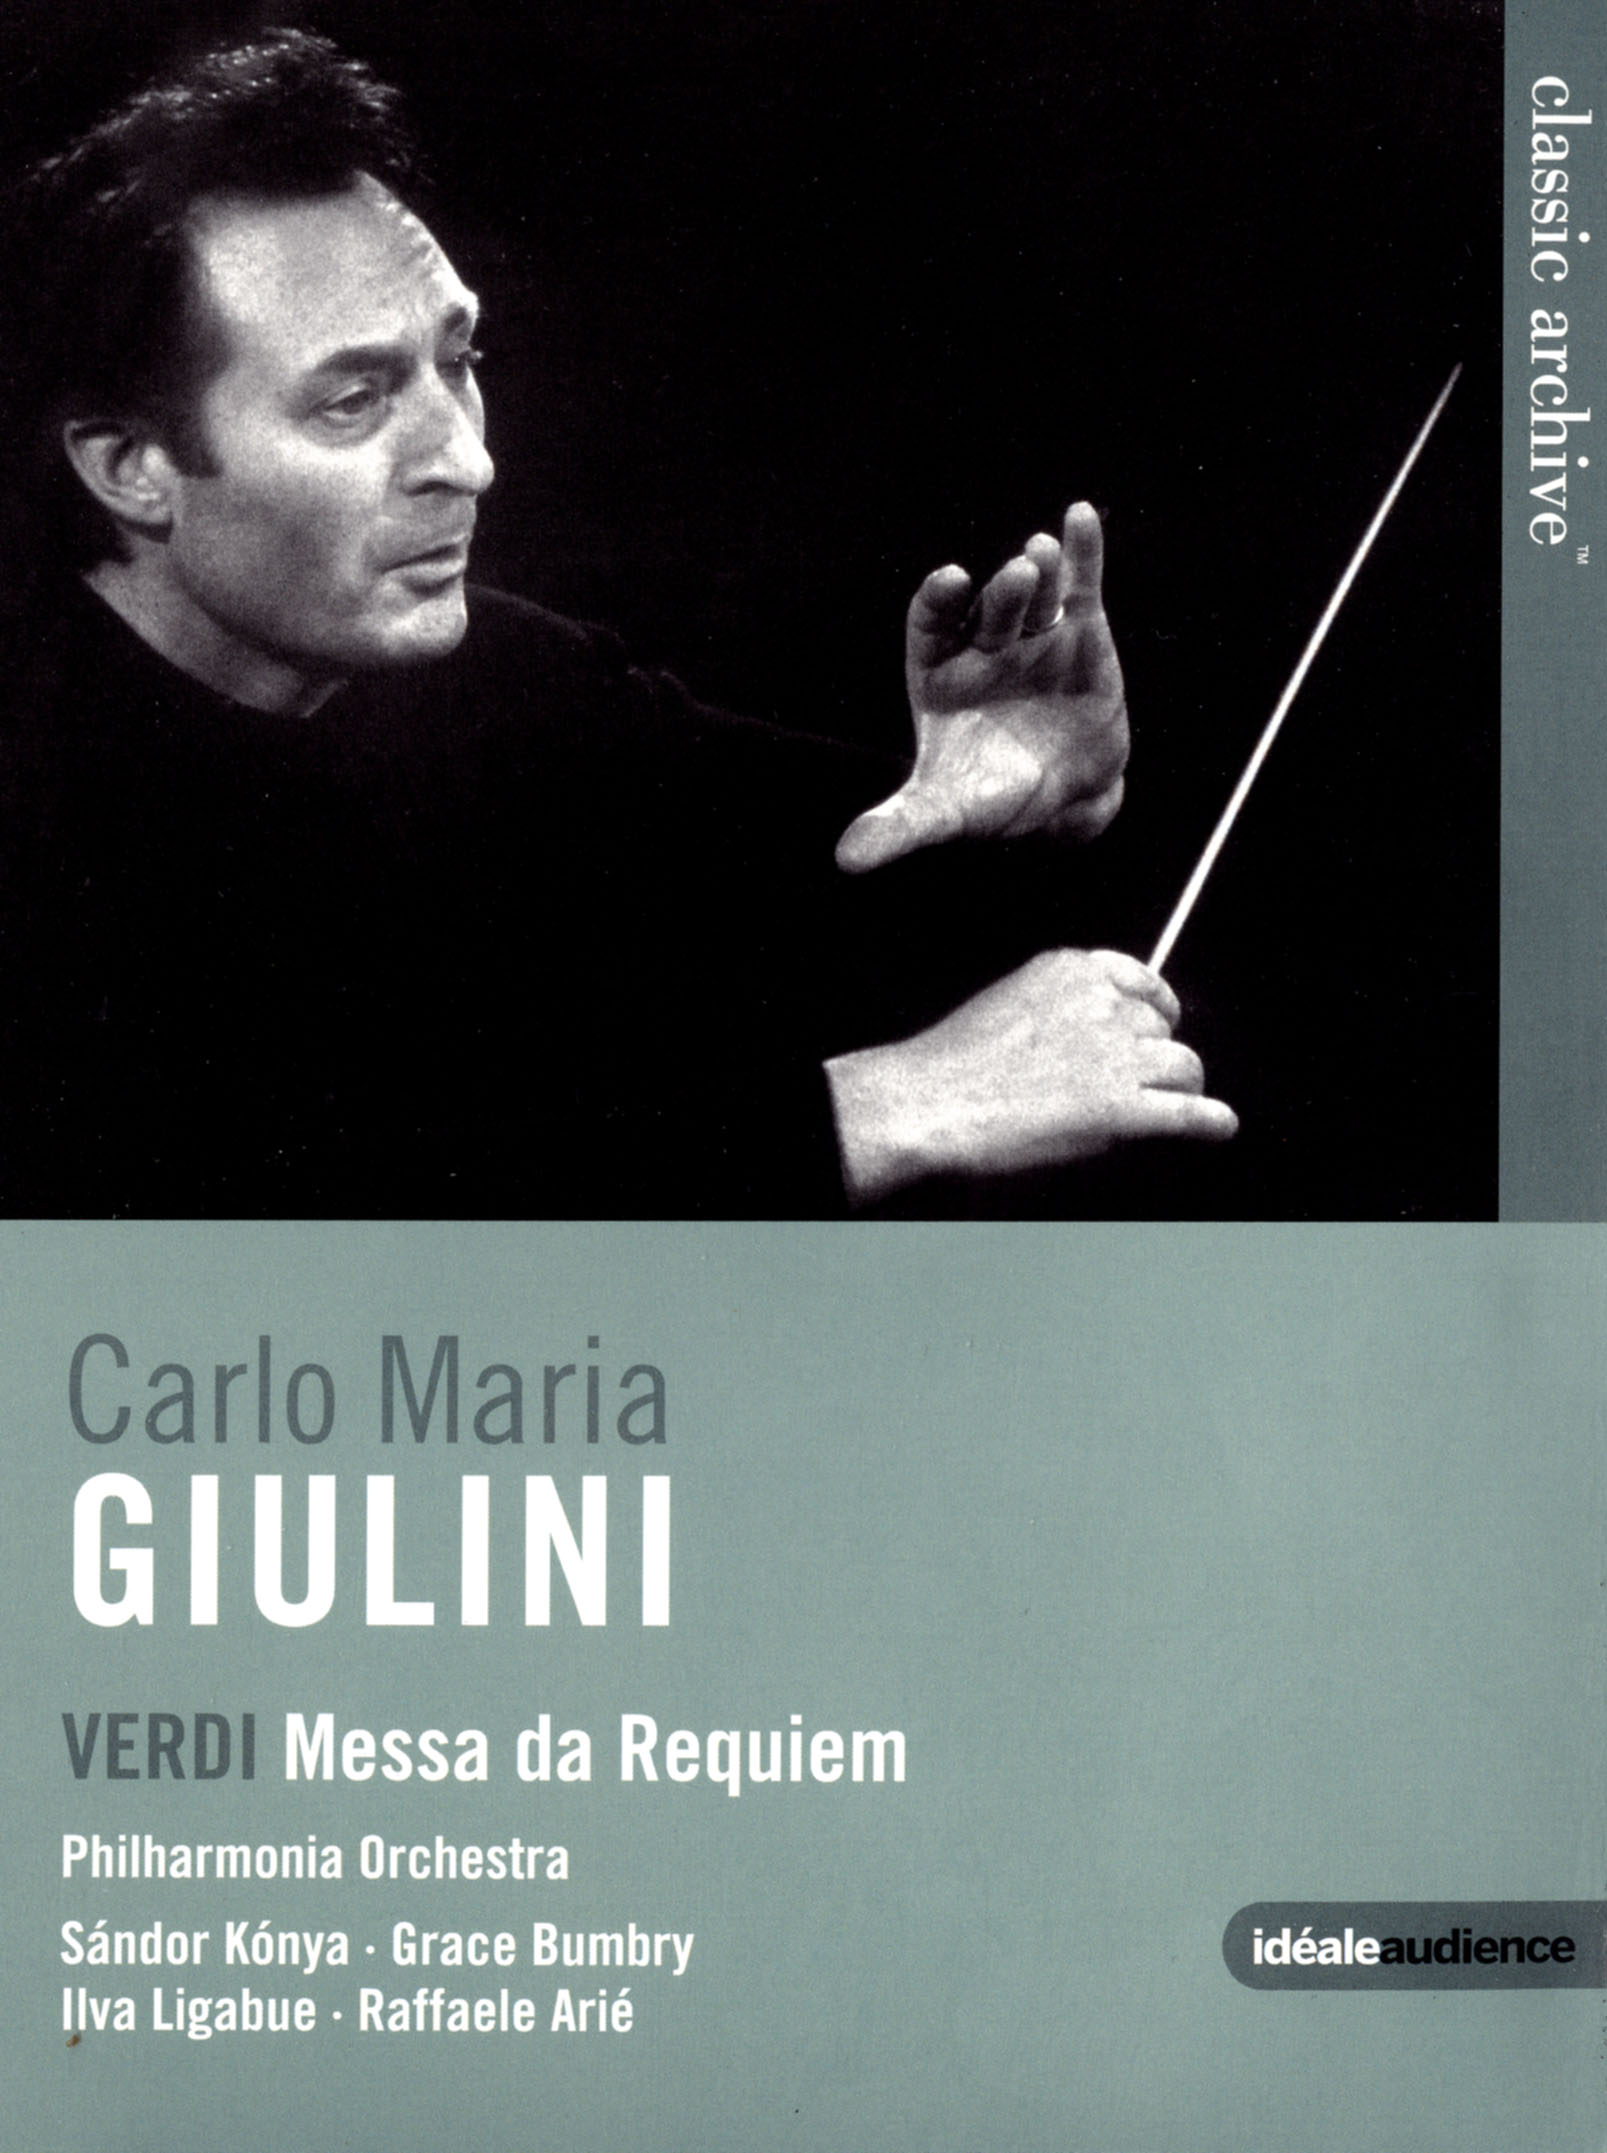 Carlo Maria Giulini/Philharmonia Orchestra: Verdi - Messa da Requiem